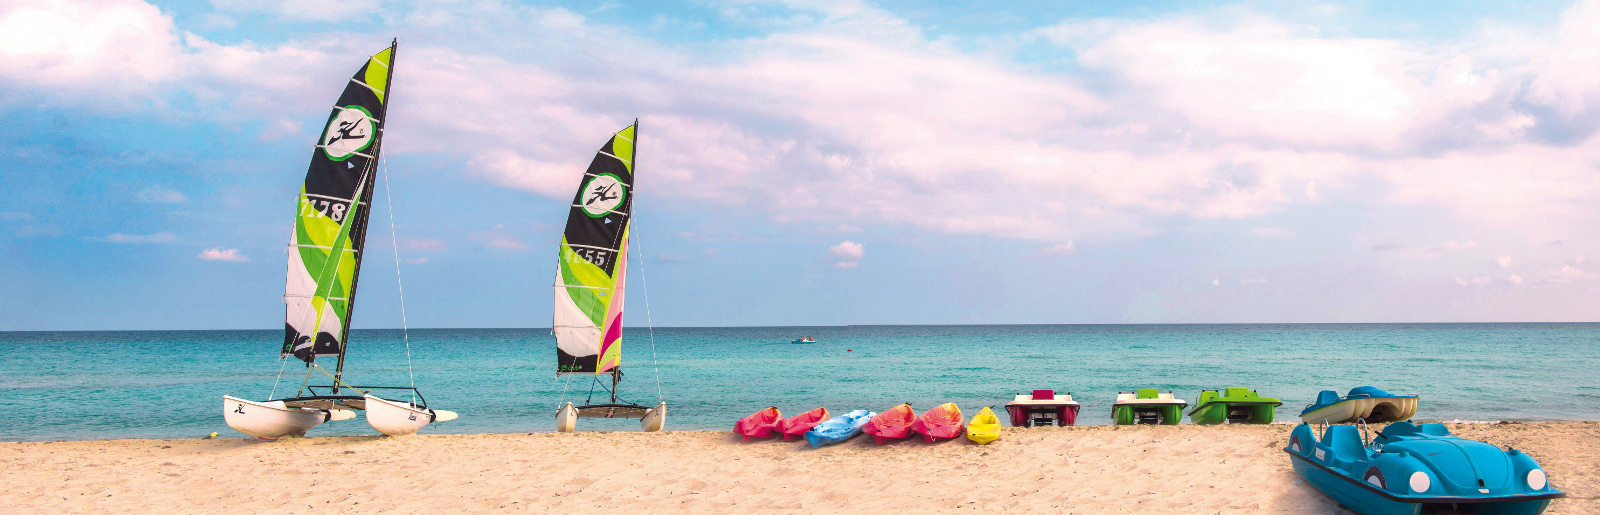 Playa Varadero - Be Live